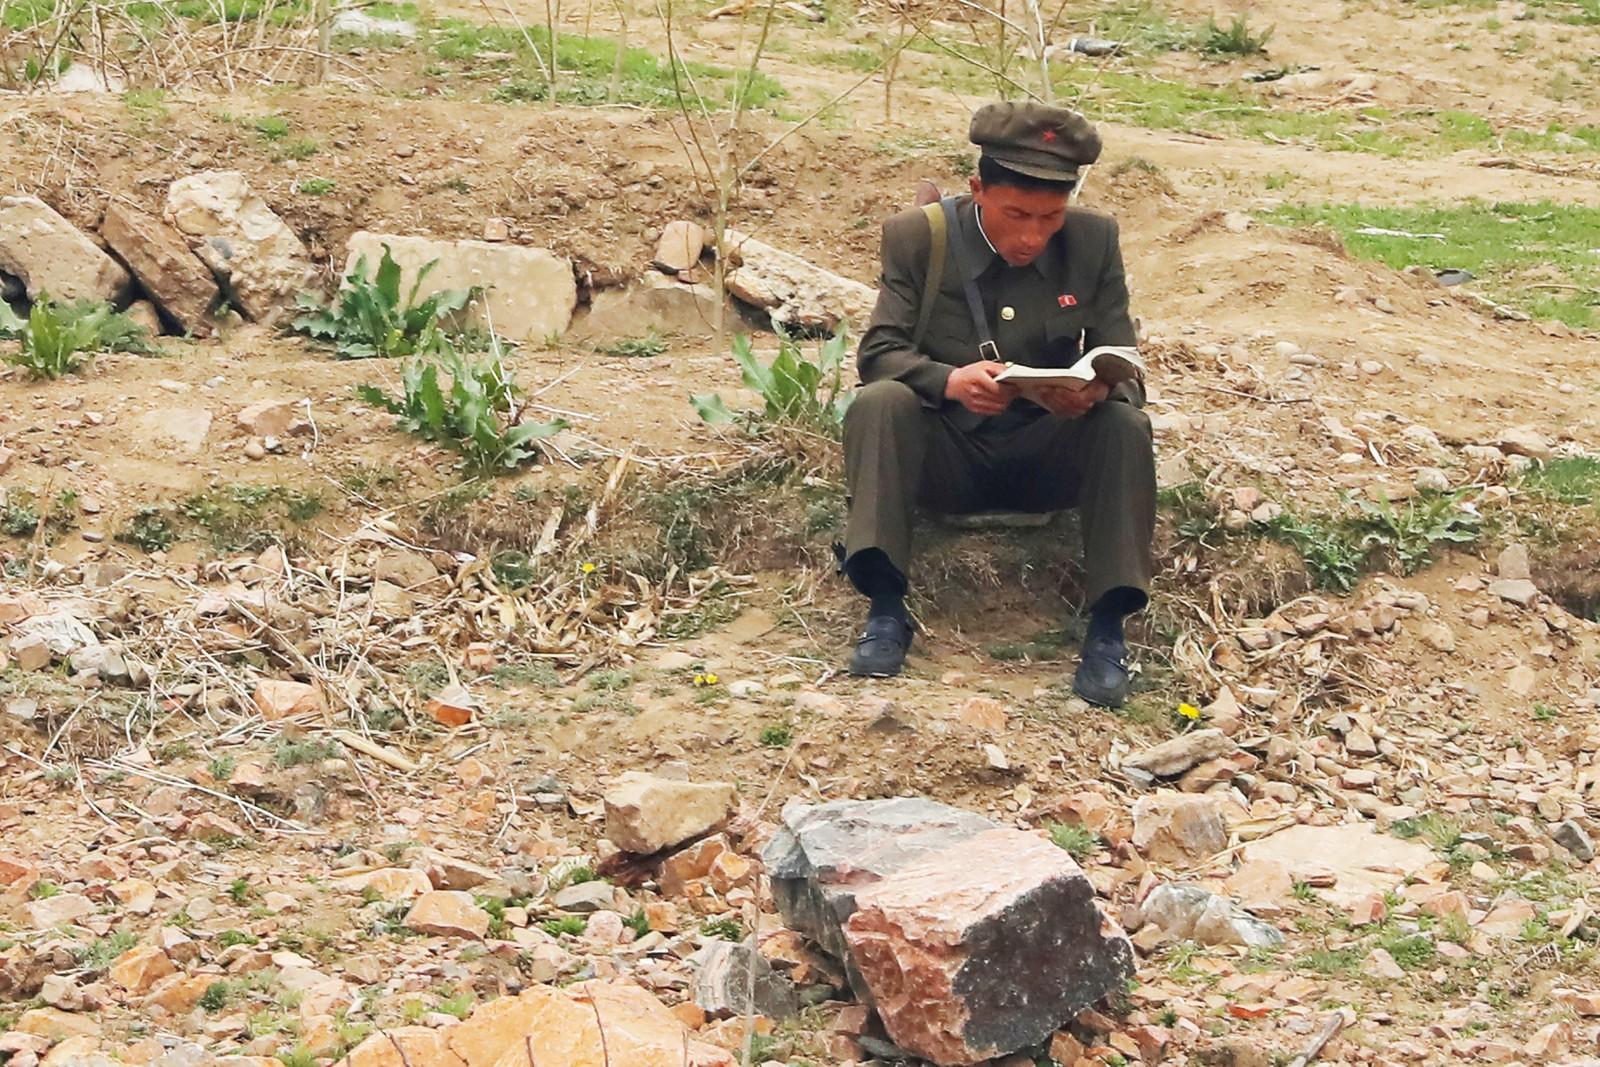 En nordkoreansk soldat ved Talu-elva.